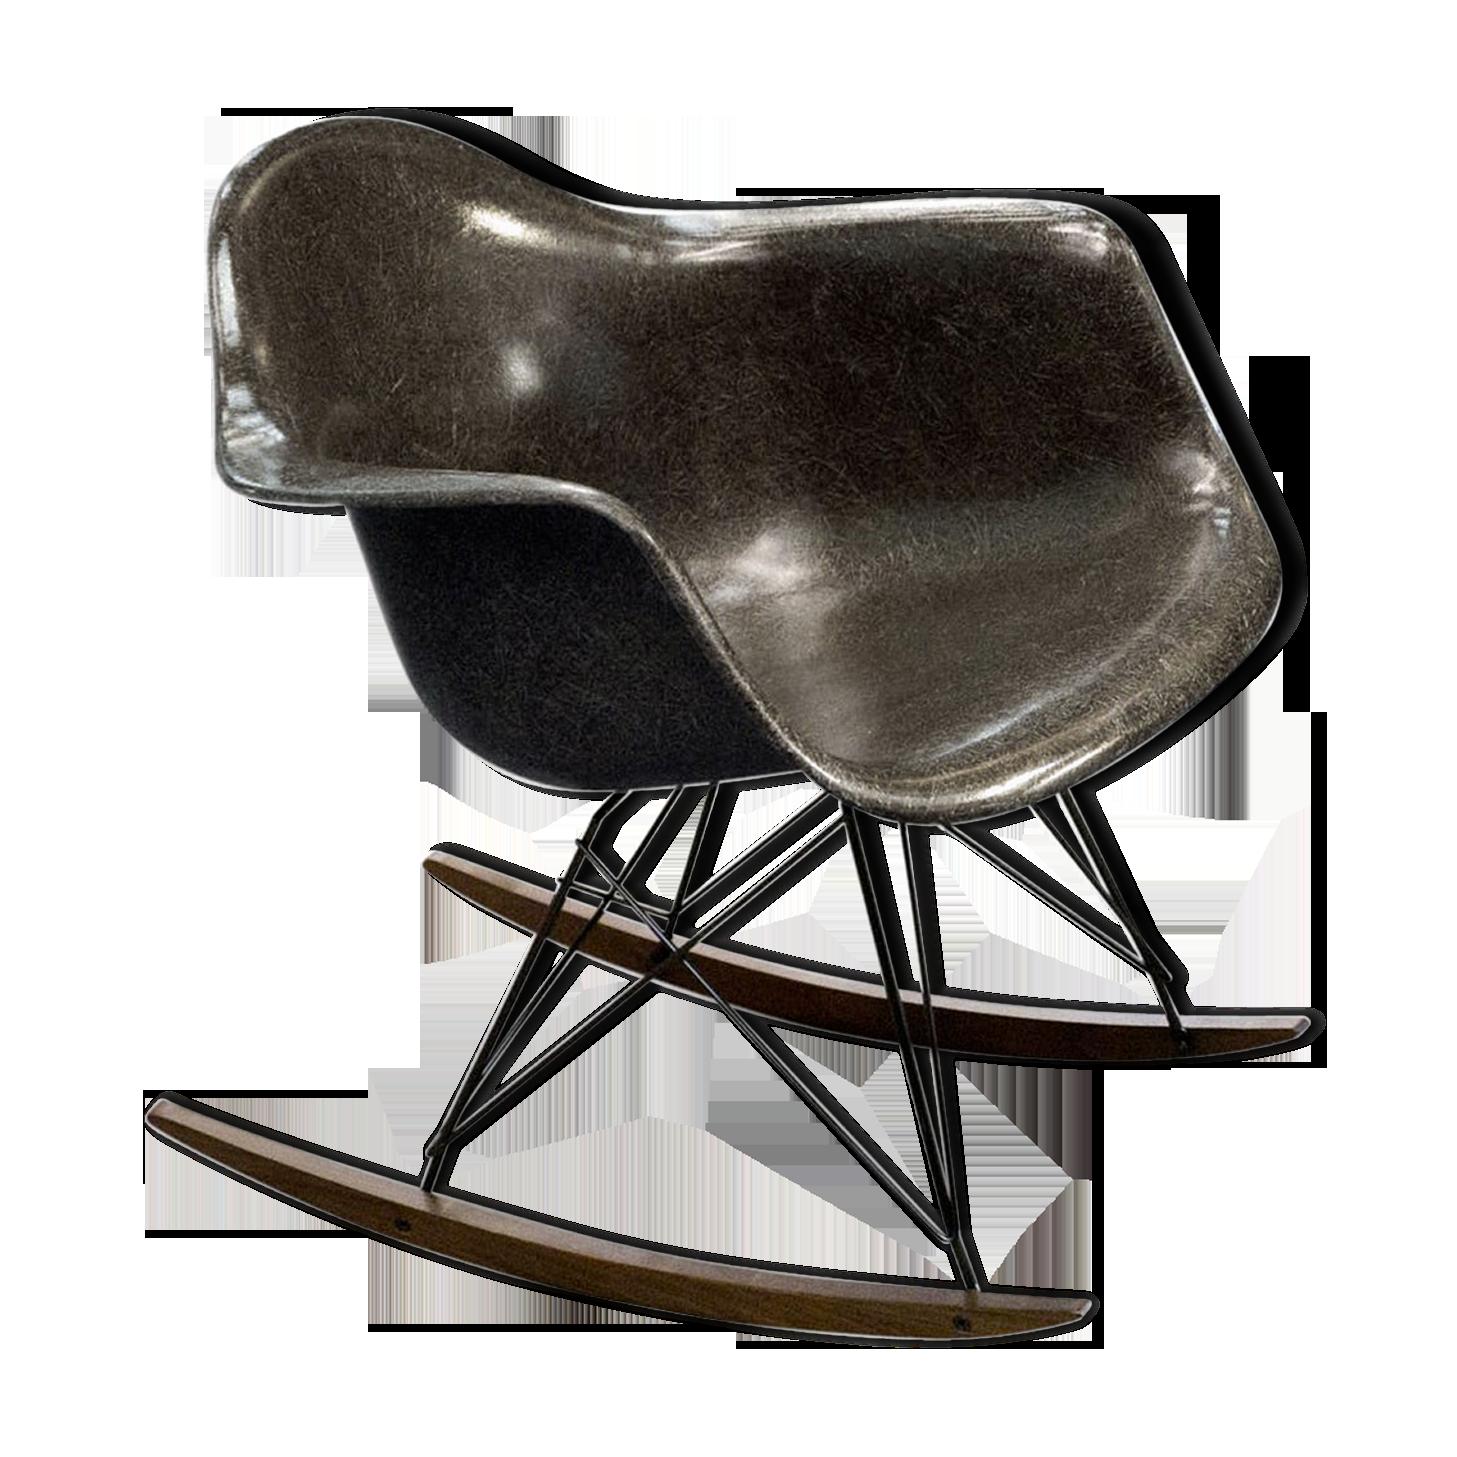 Eames Rocking Chair : Rocking chair herman miller eames fiberglass brown design